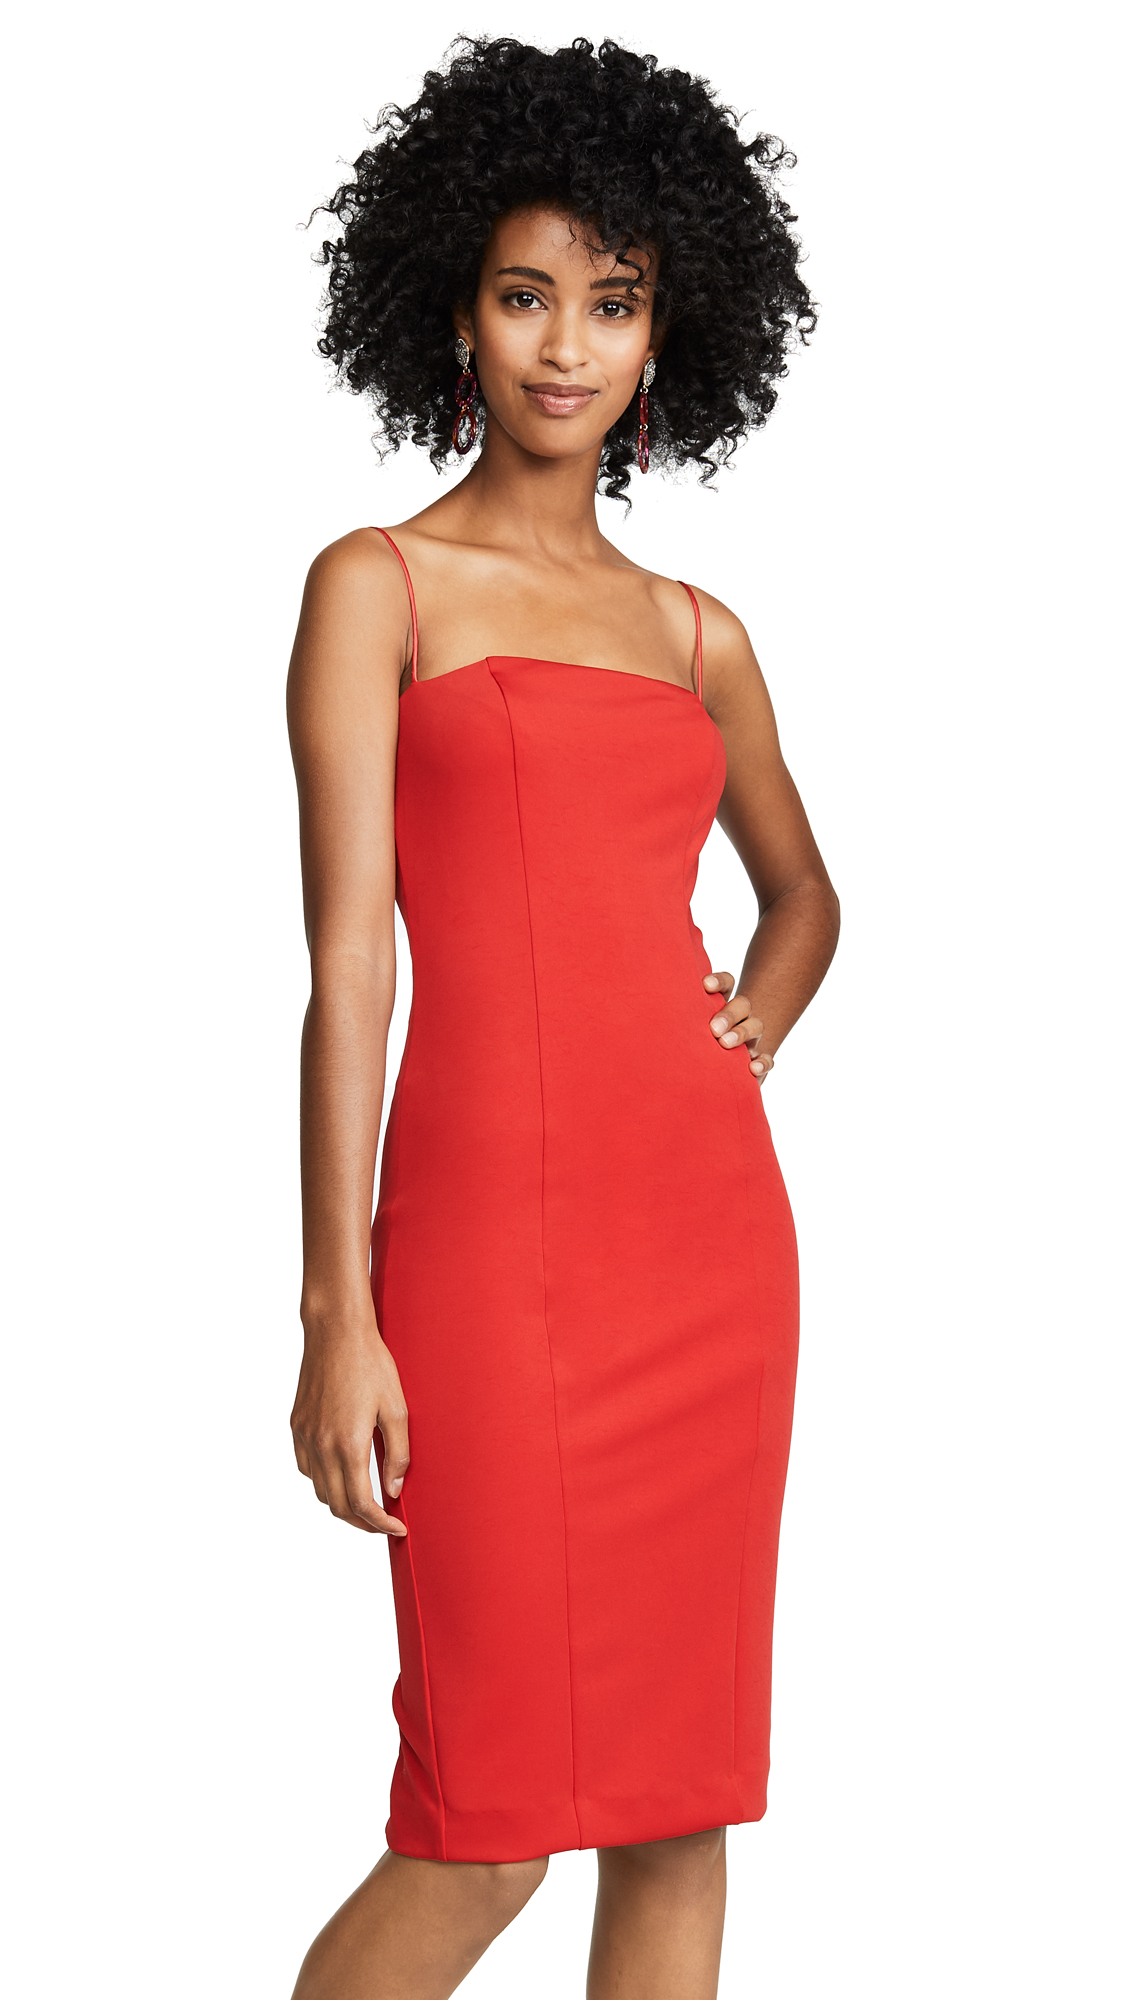 Misha Collection Sophie Dress